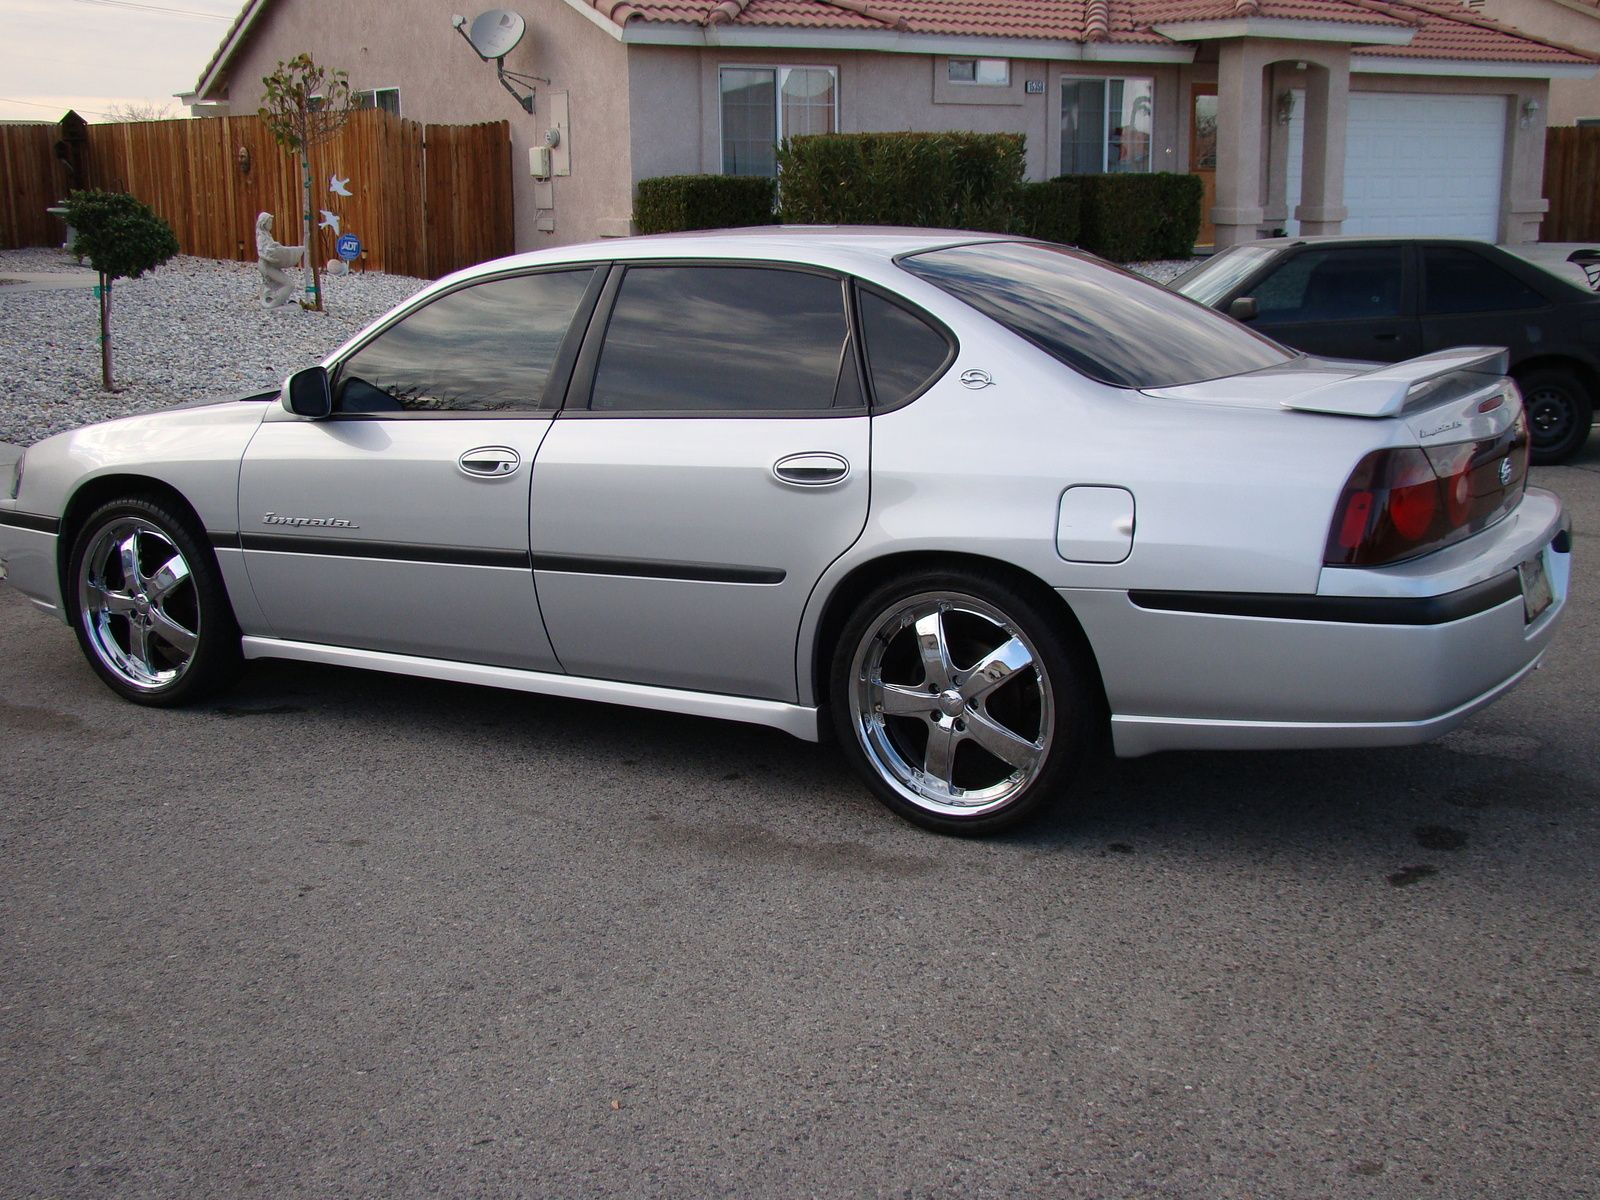 love this car 2000 chevrolet impala ls for fuel efficiency with 2000 chevrolet impala ls this is the car you want [ 1600 x 1200 Pixel ]